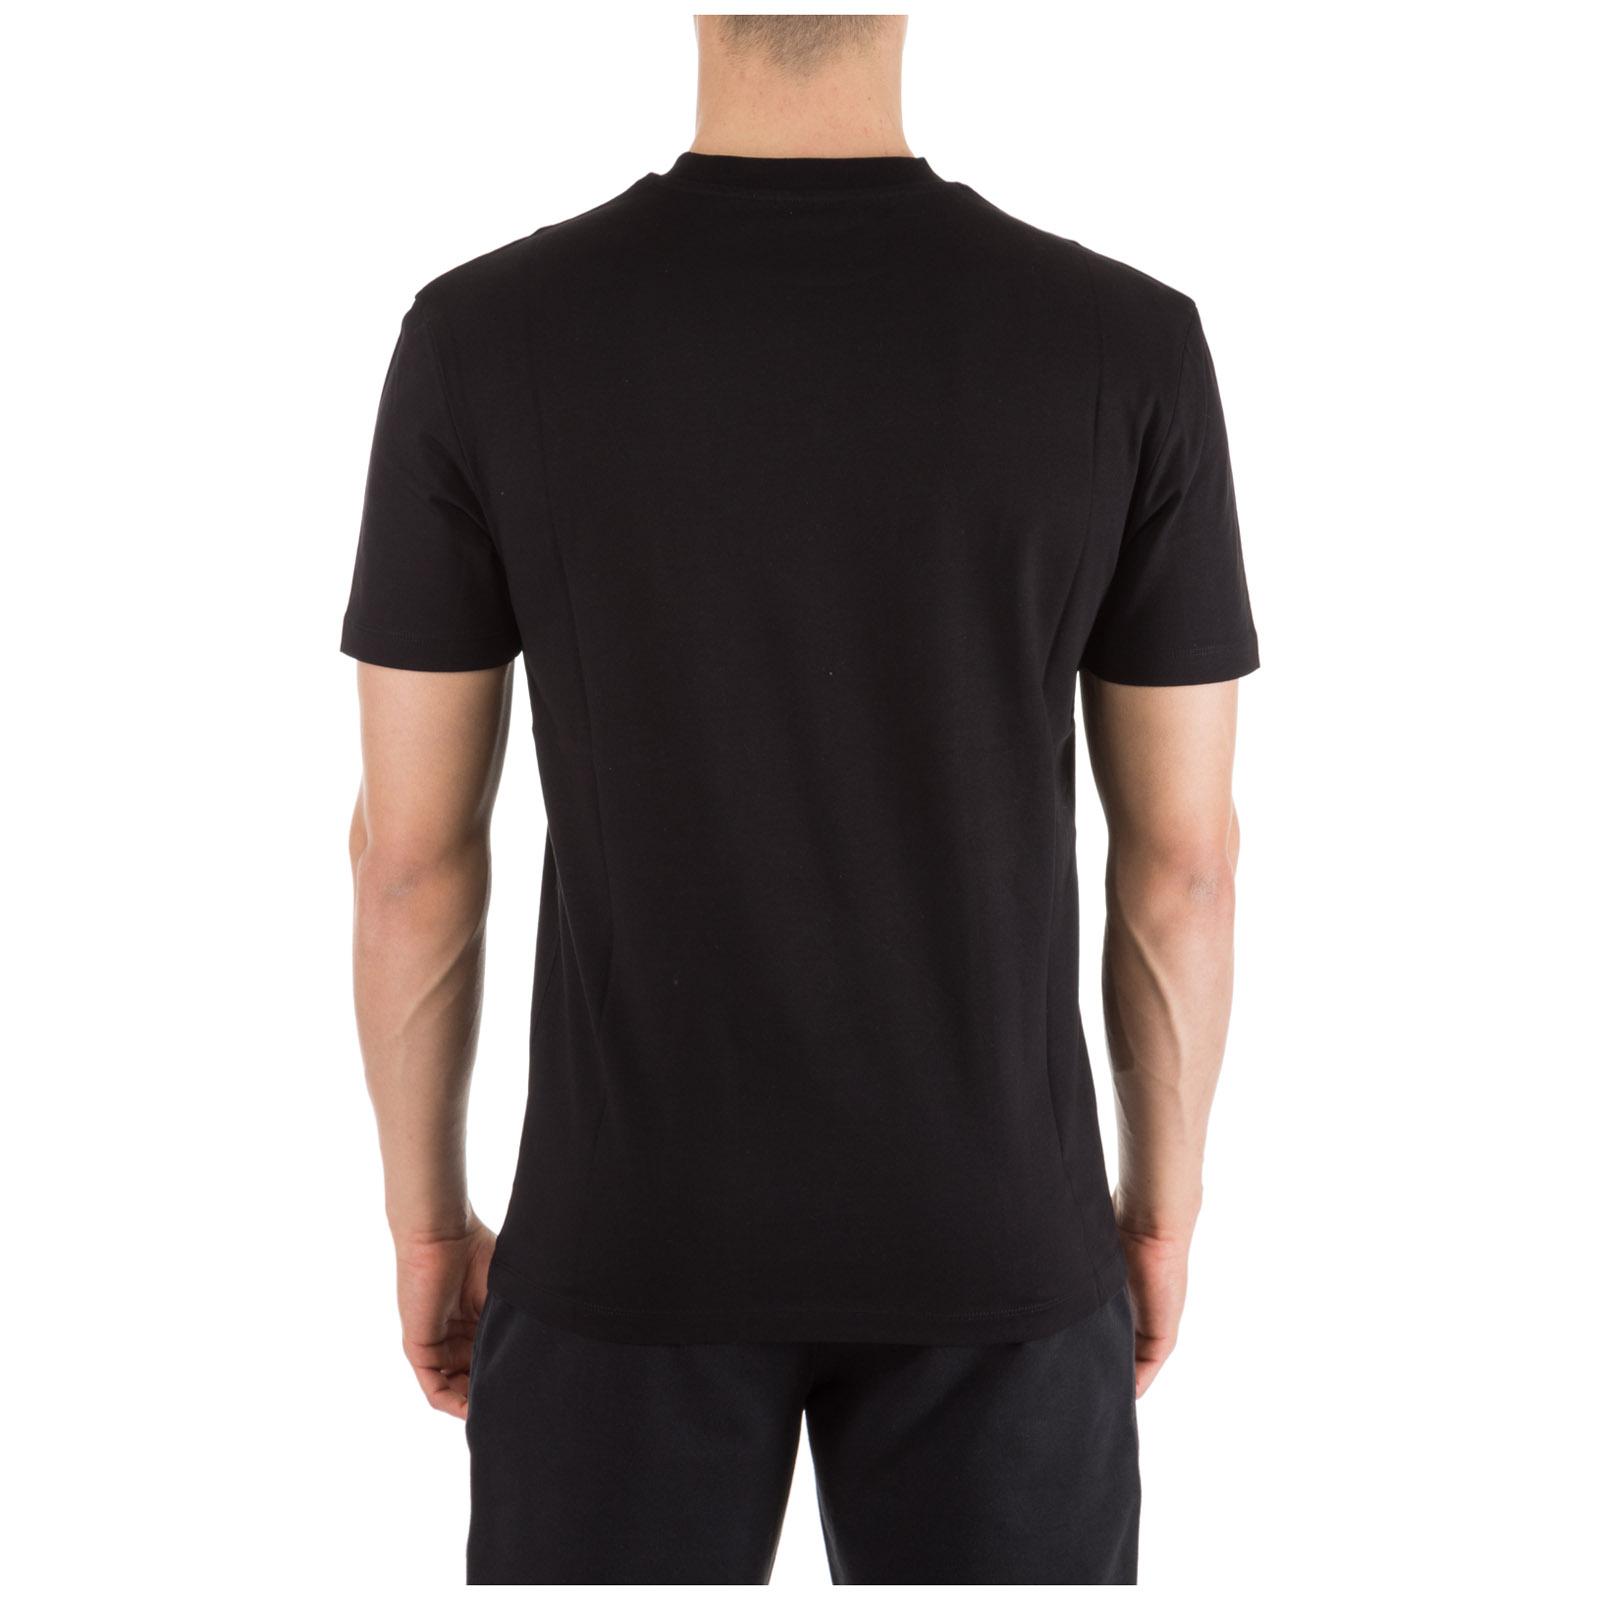 Camiseta de manga corta cuello redondo hombre